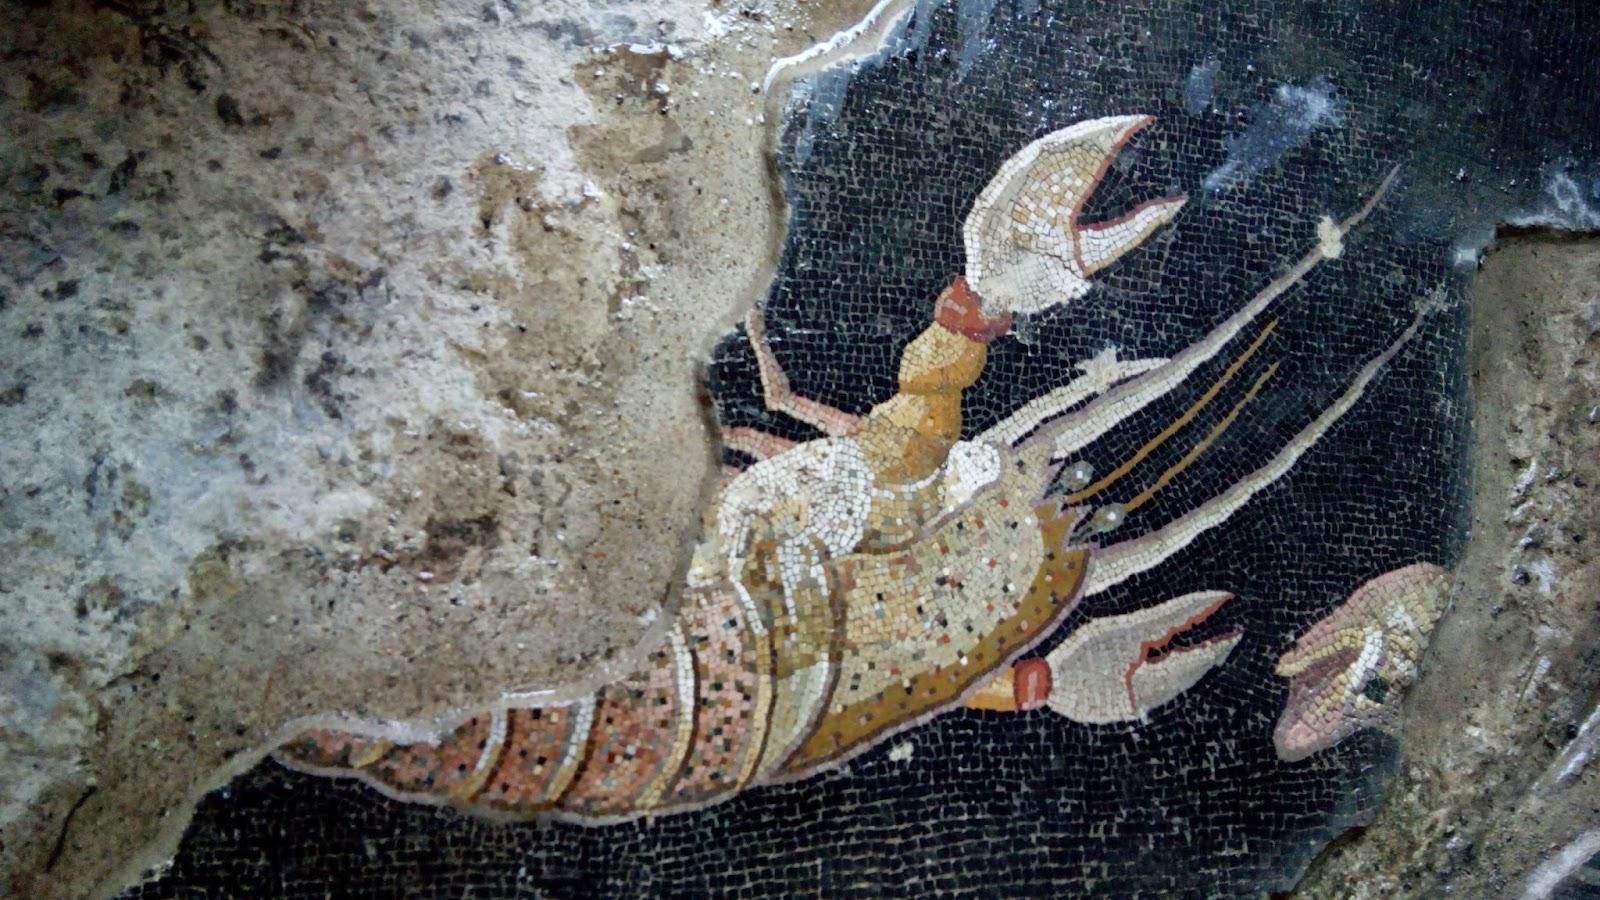 acendend mosaico palestrina3 - Bate-e-volta à Palestrina